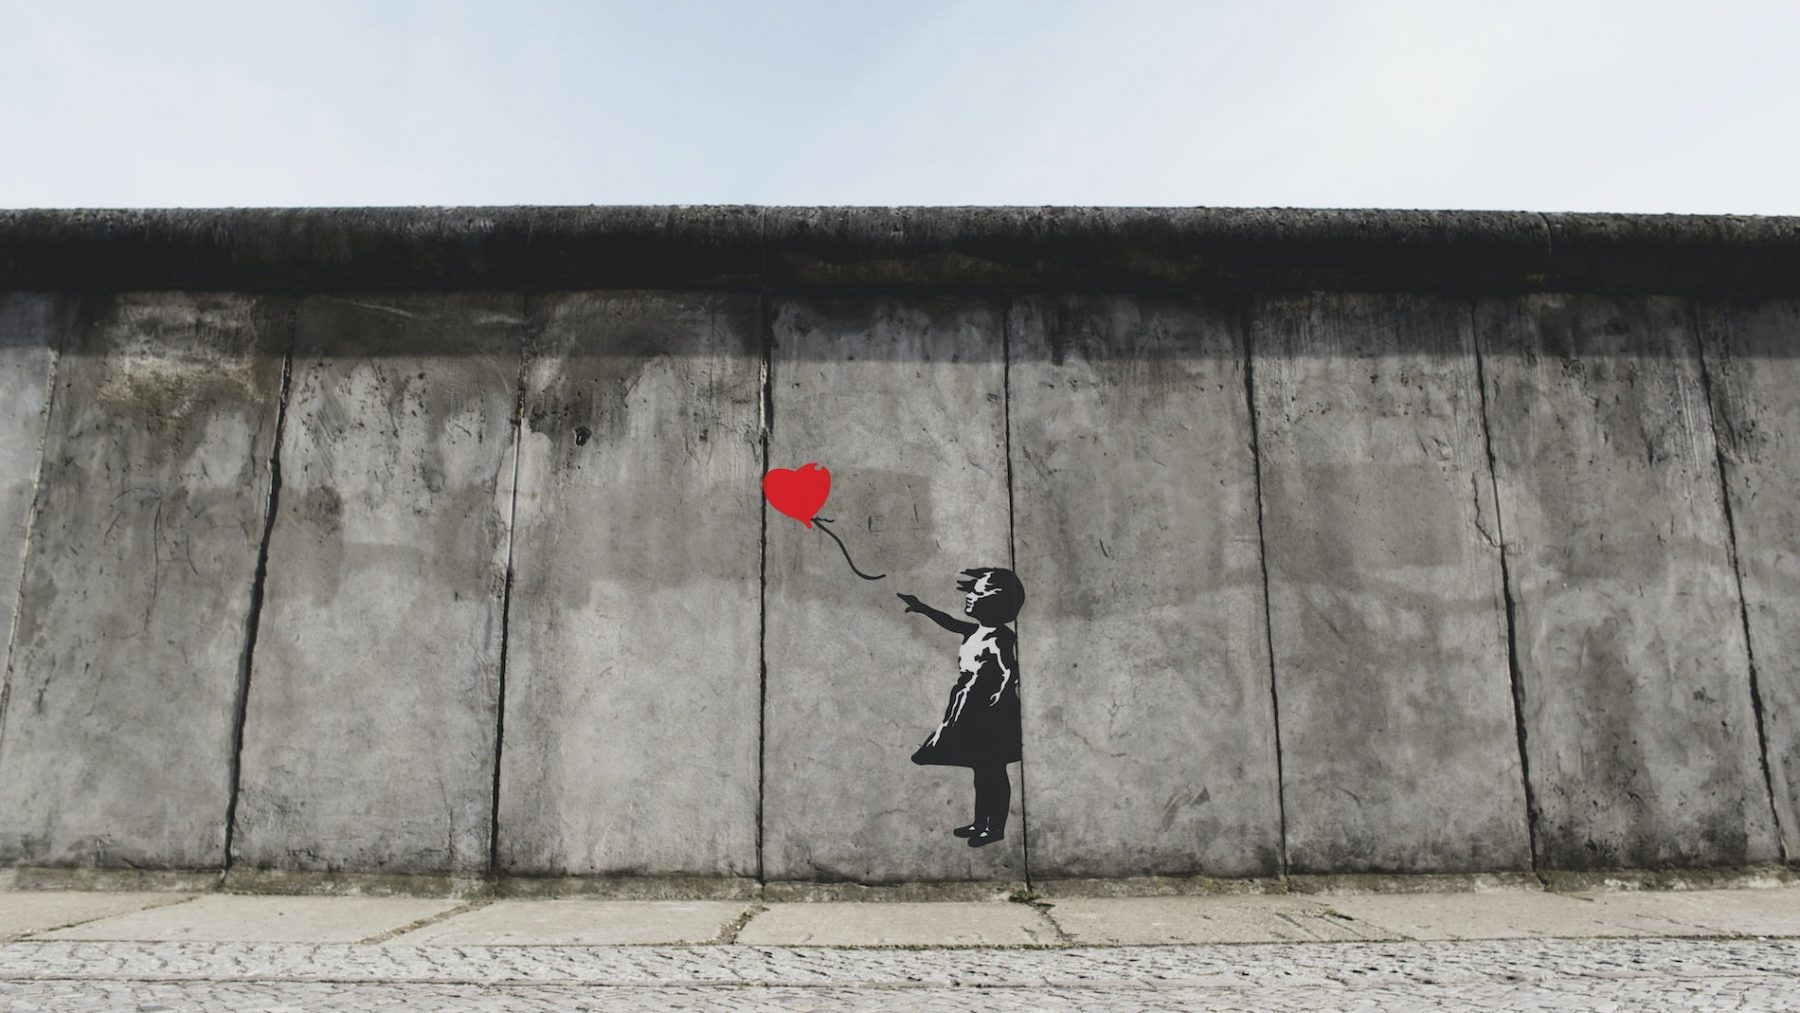 banksy kunstenaar zwolle kunst art